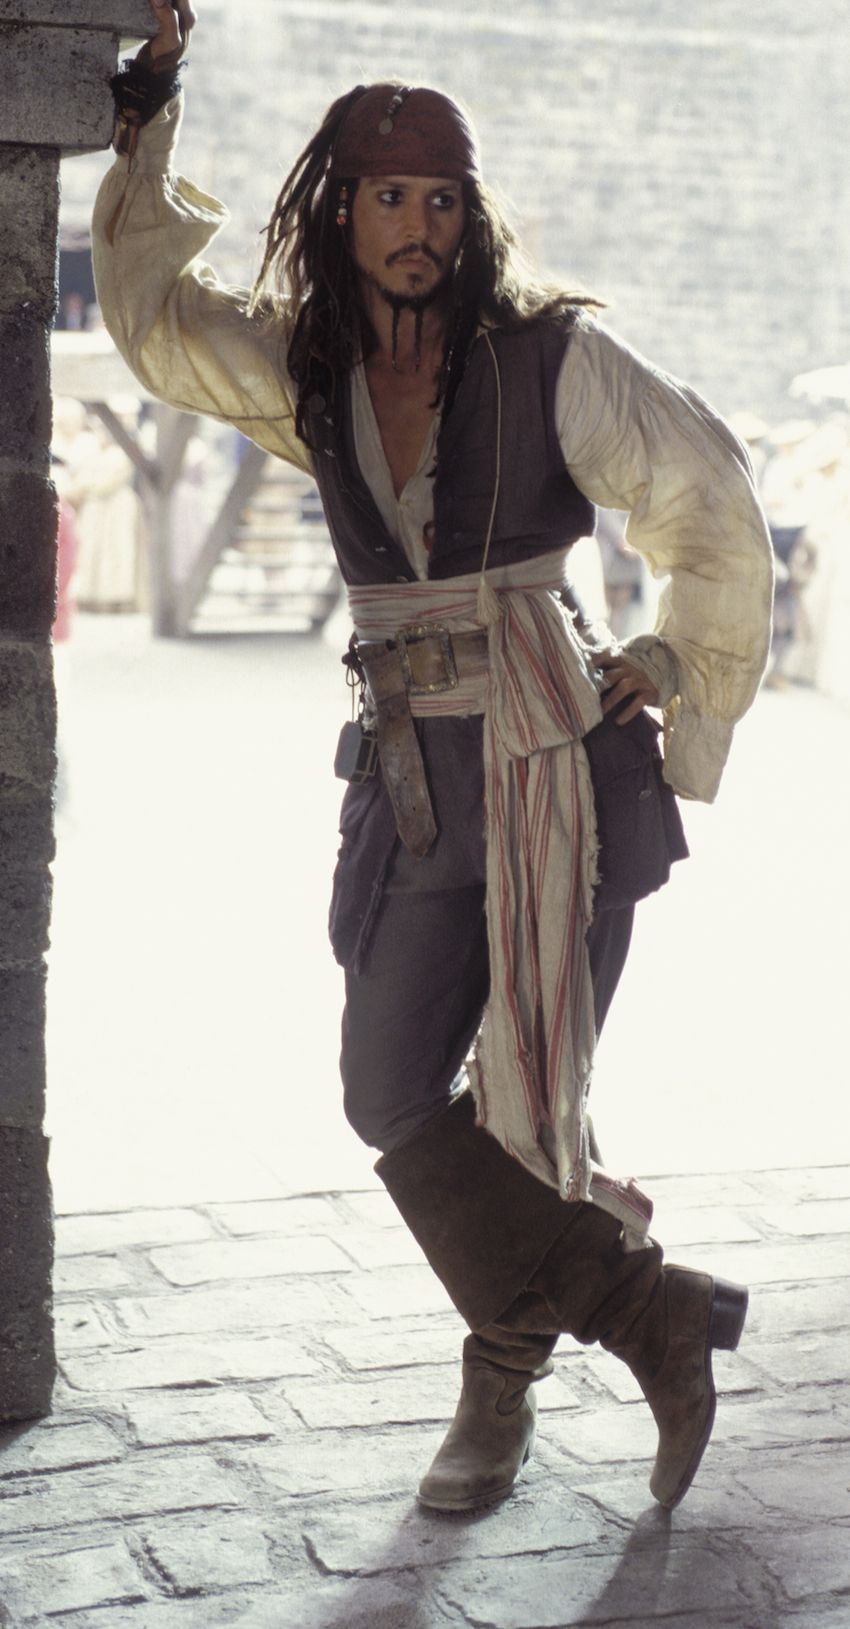 Posing Tips From Captain Jack Sparrow | Oh My Disney